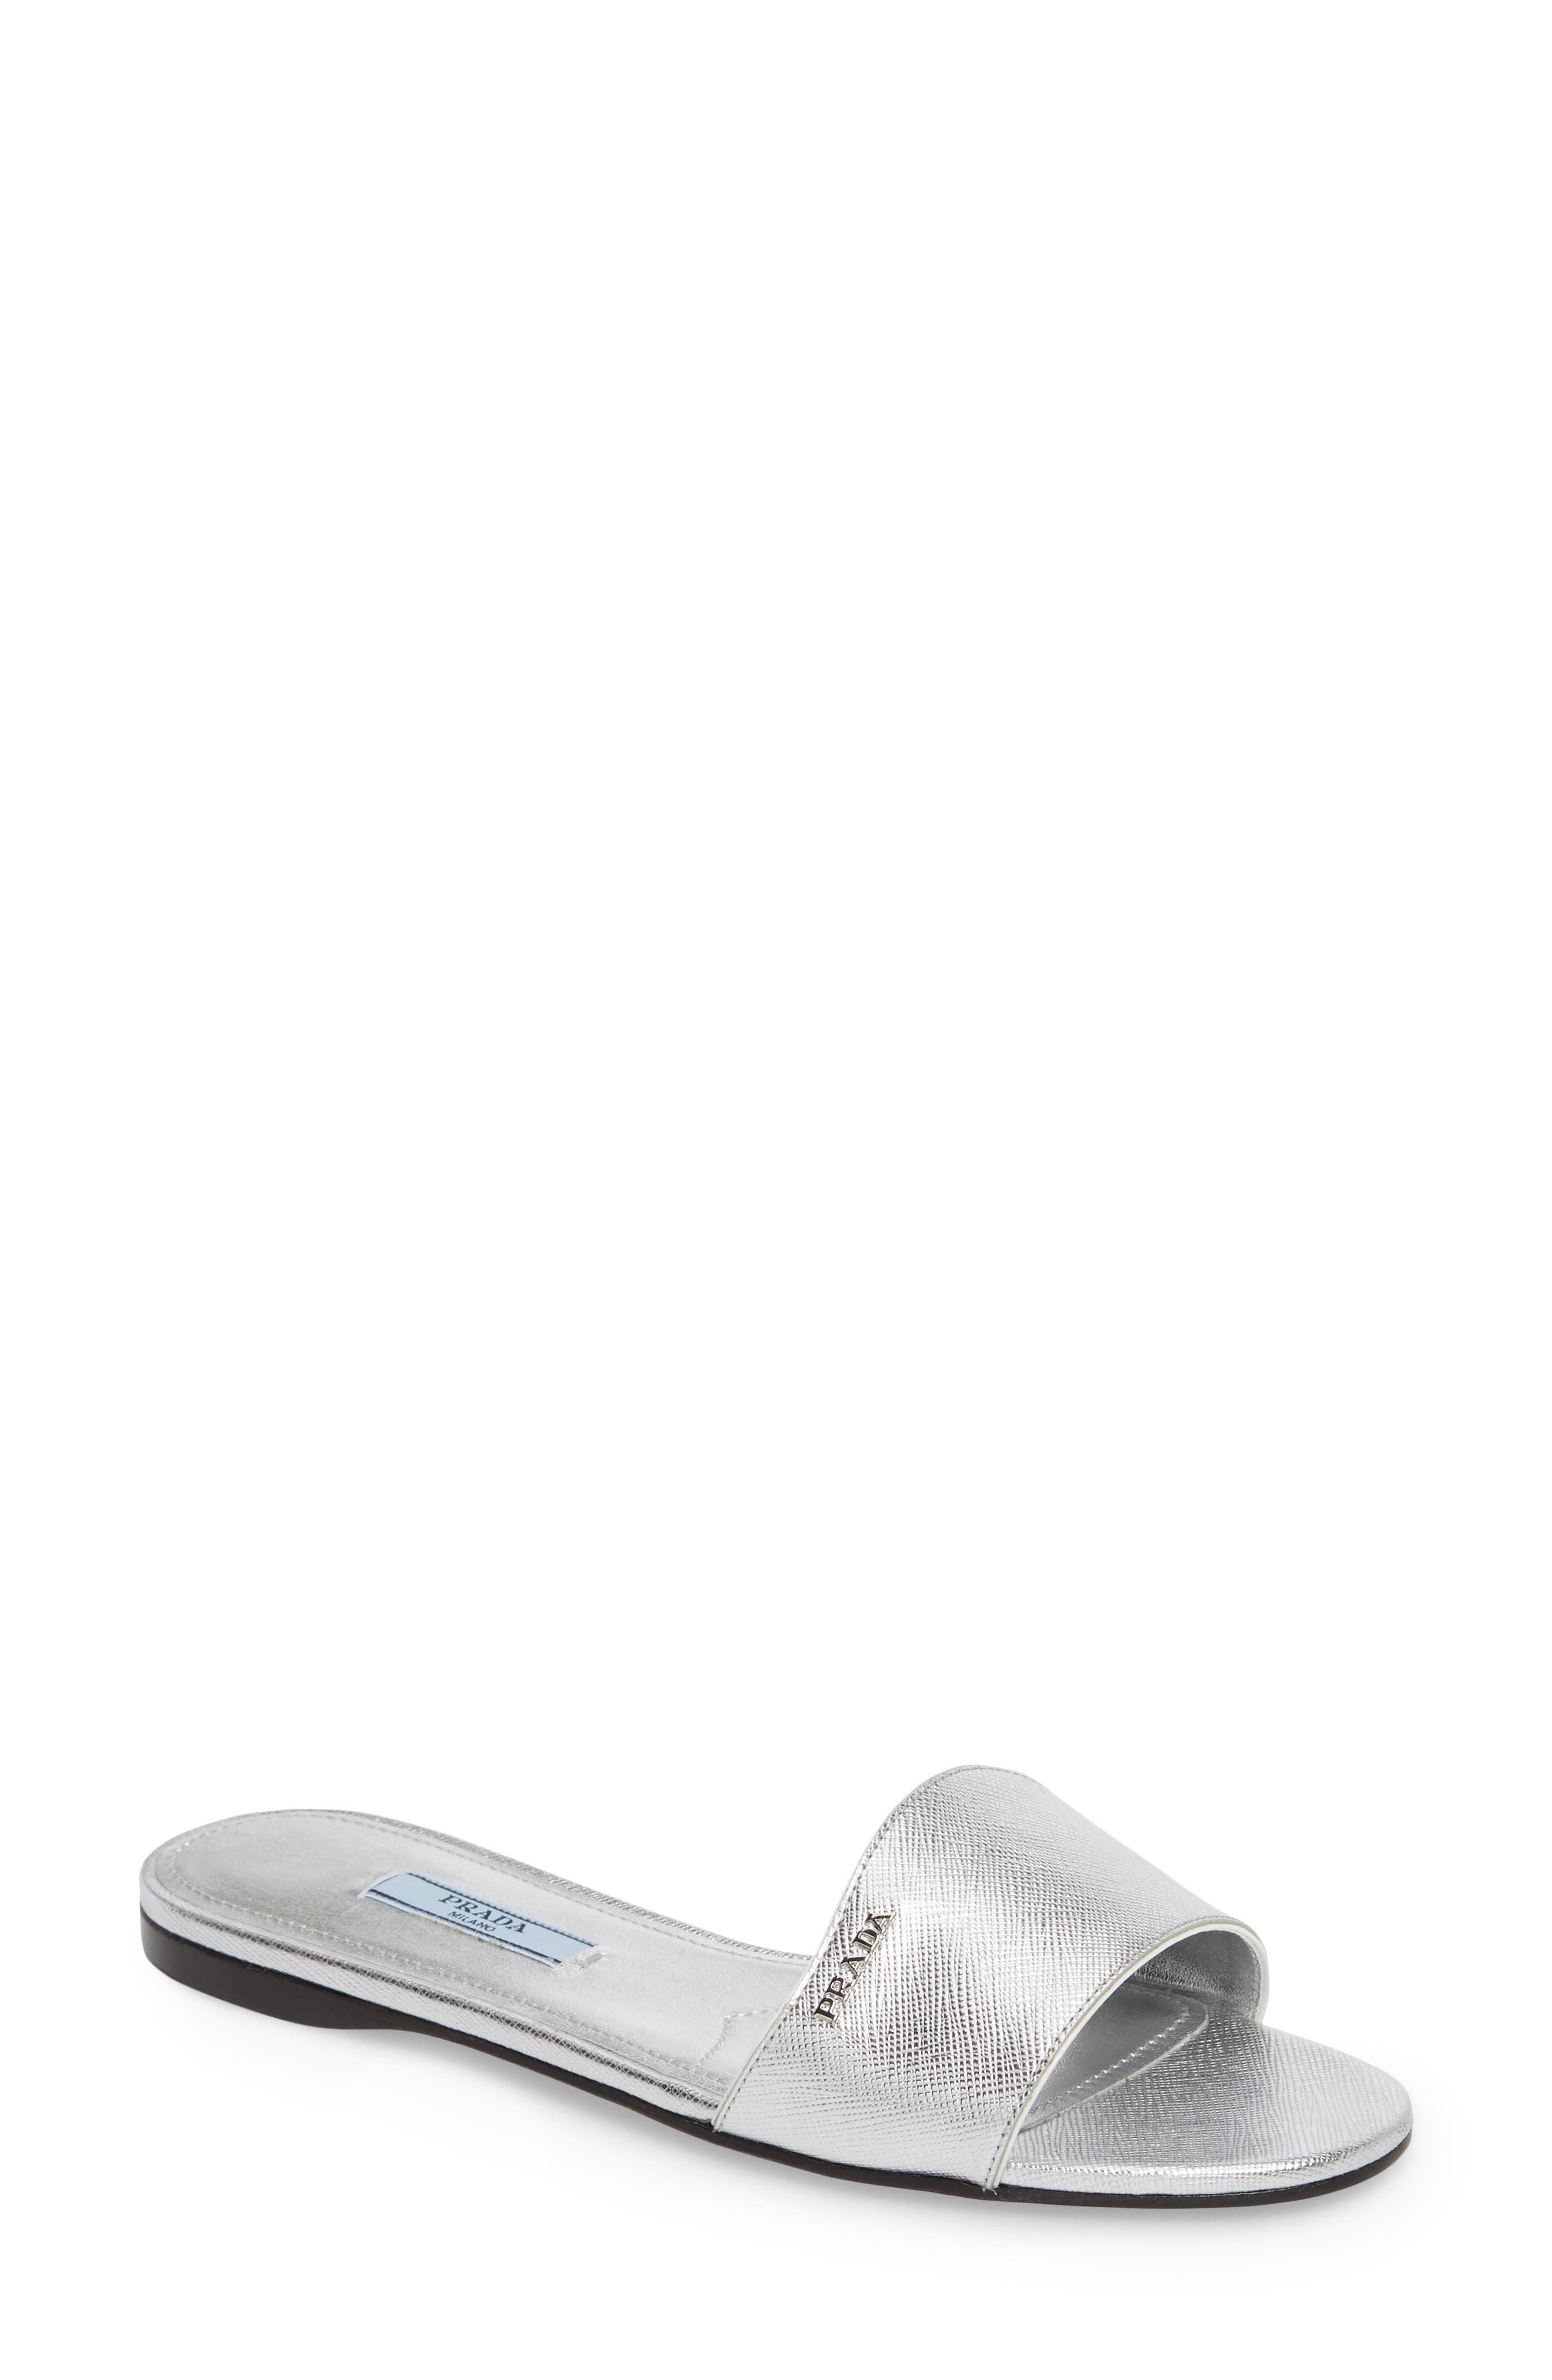 Slide Sandal,                         Main,                         color, Silver